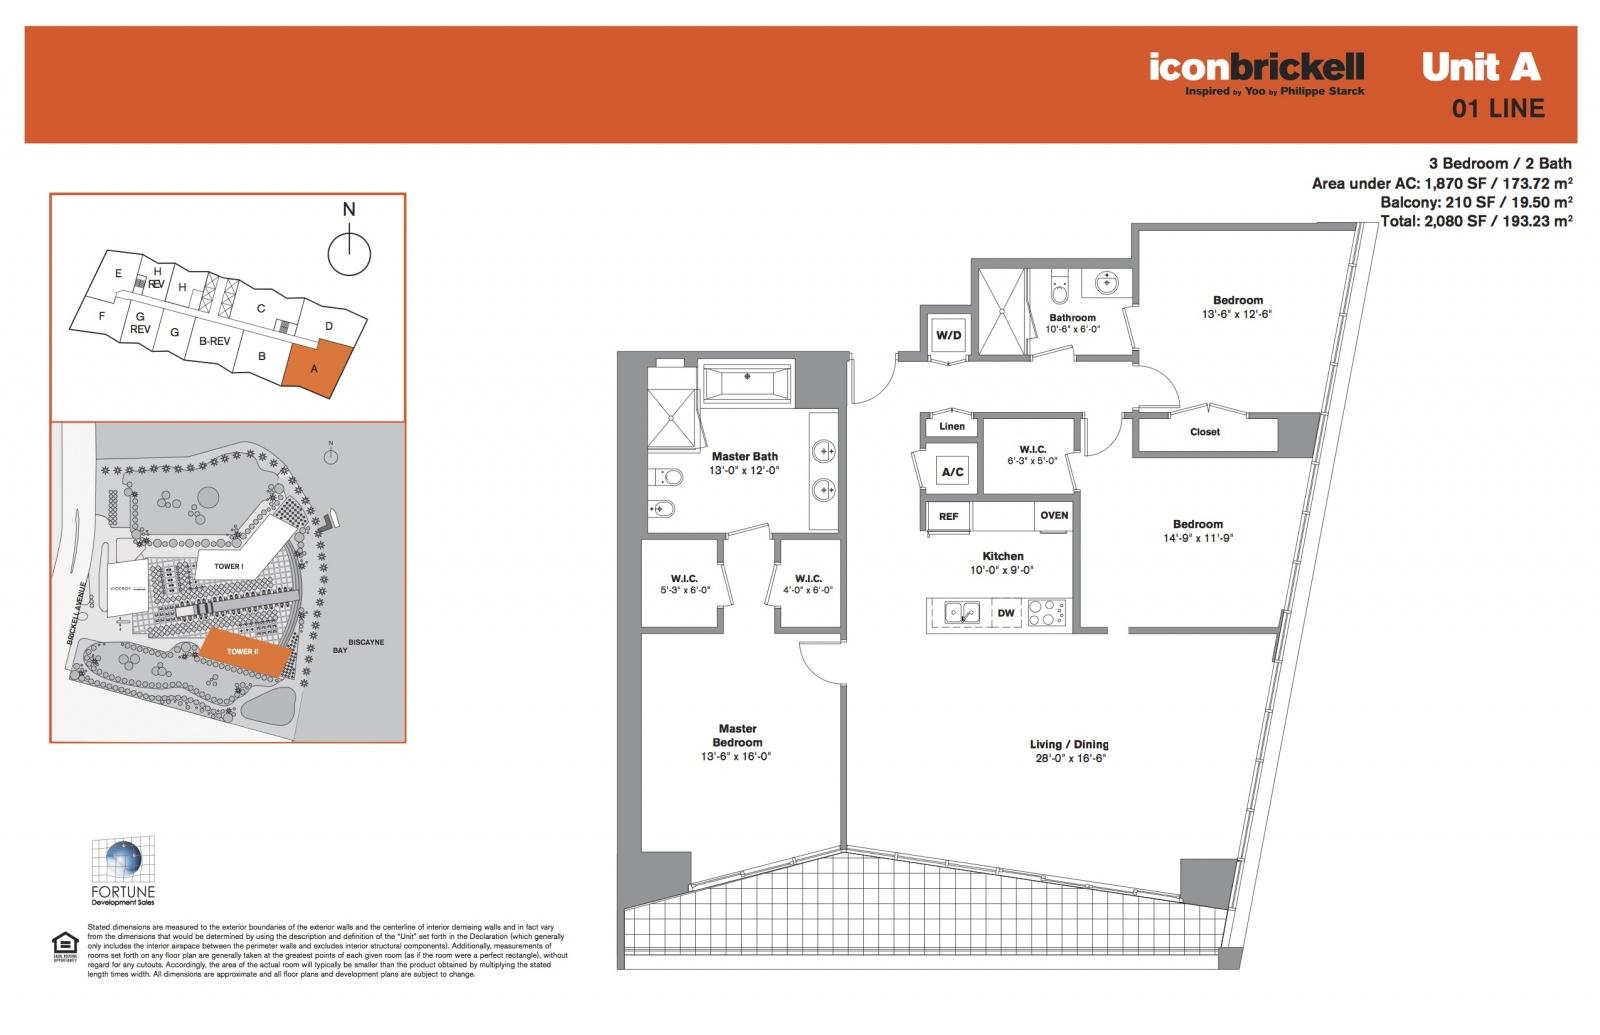 Icon Brickell Two, line 01 floor plan